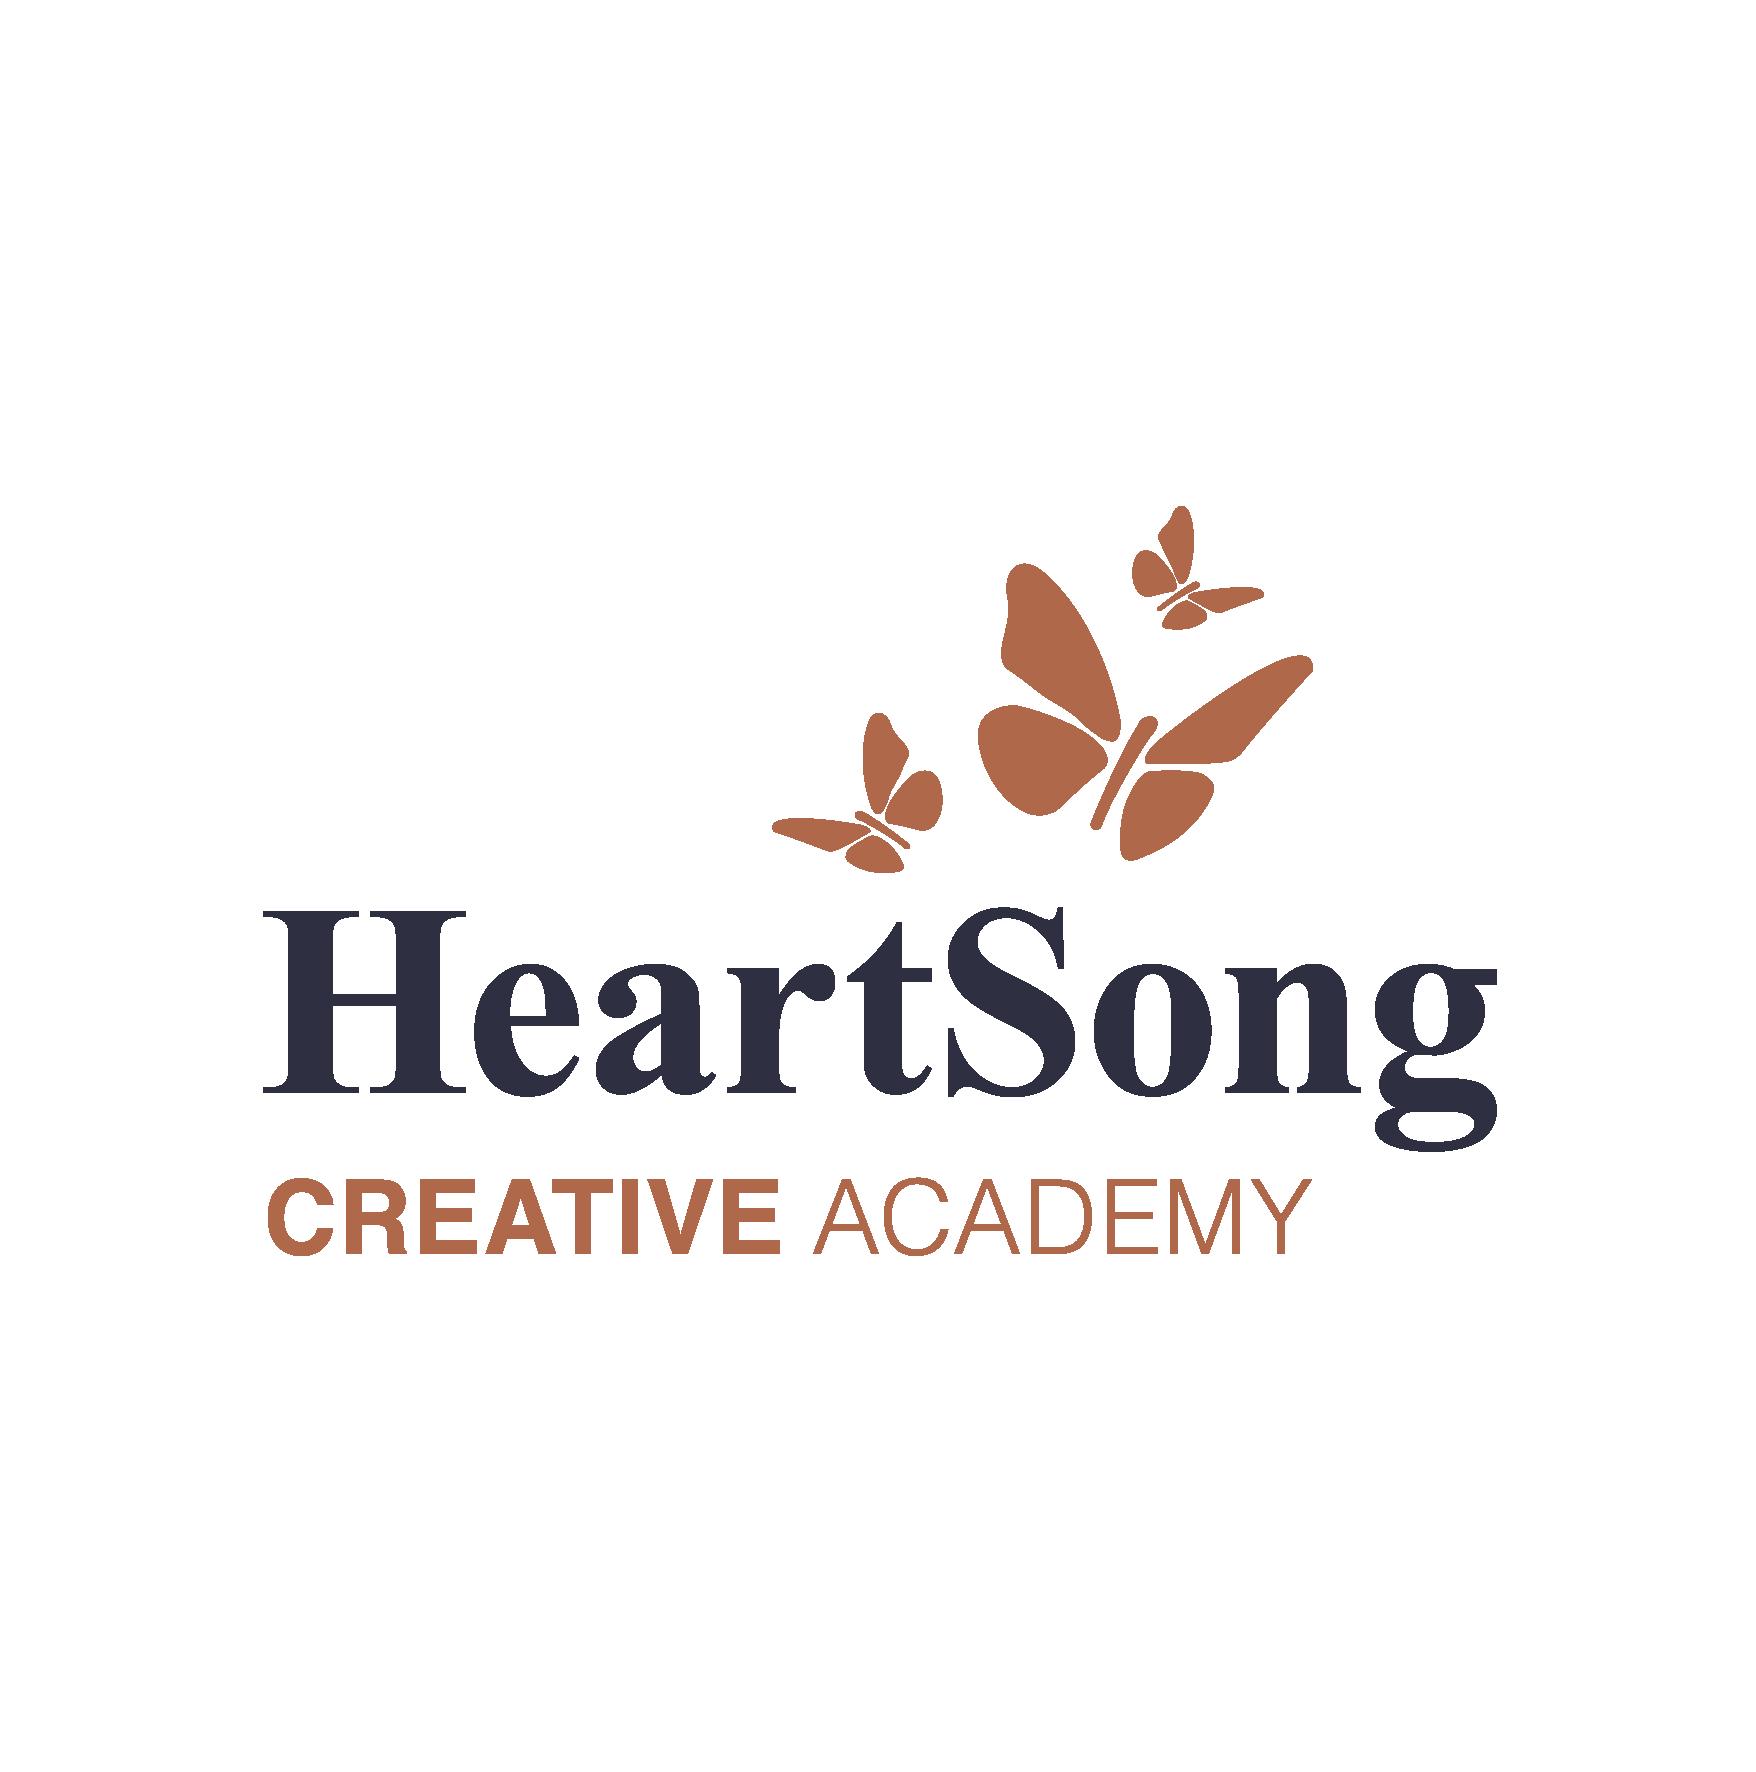 HeartSong Creative Academy